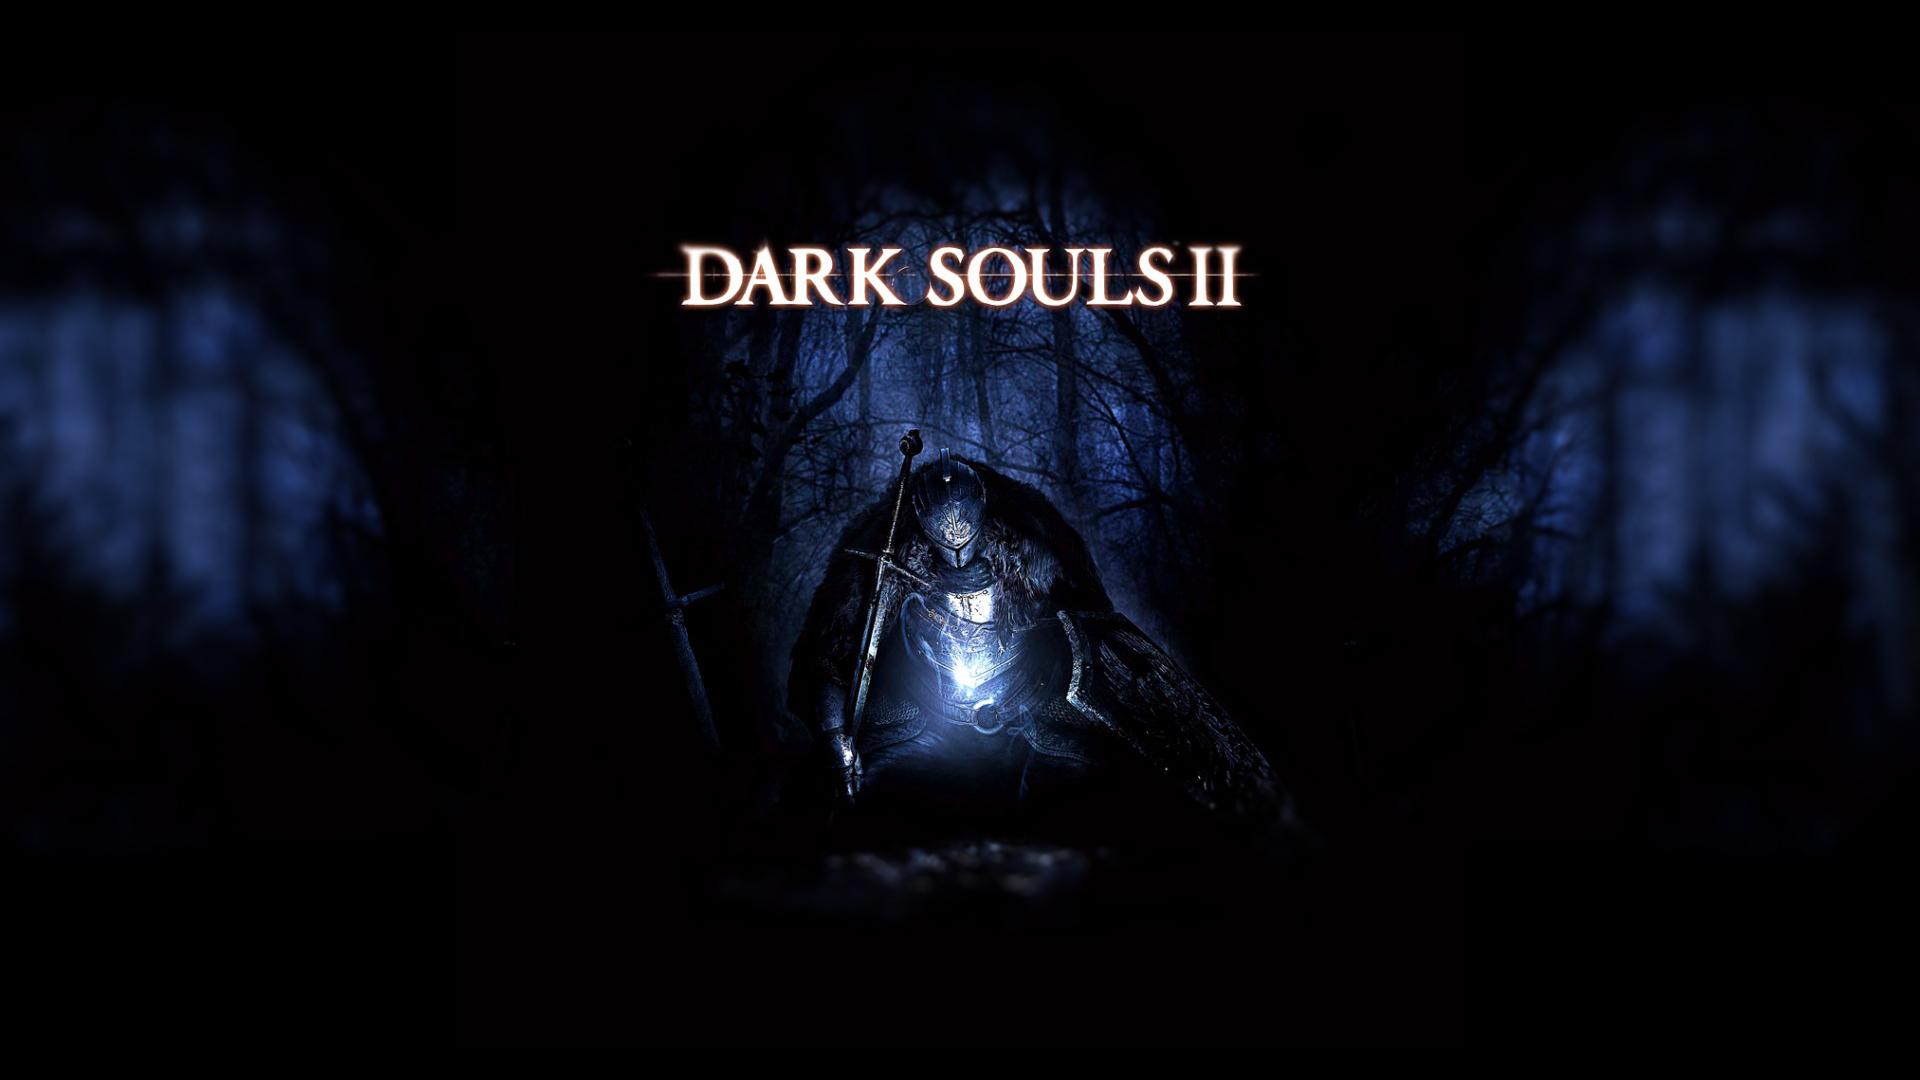 Free Download Dark Souls 2 Wallpaper By Dragoncrestpc 1920x1080